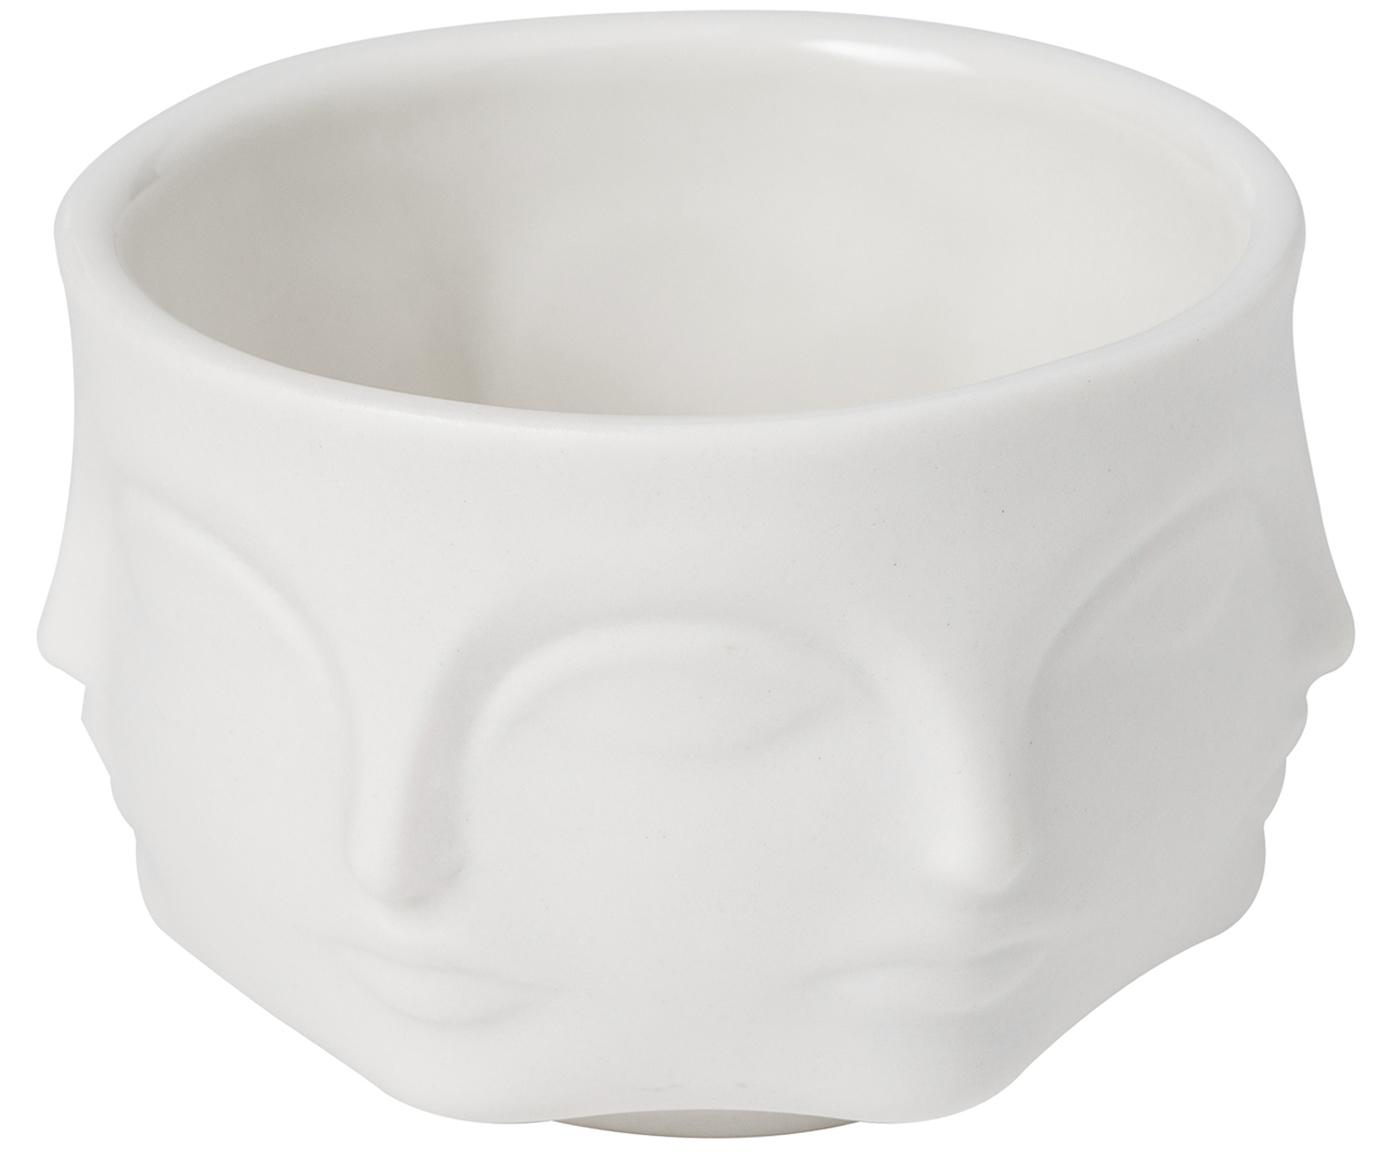 Ciotola di design in porcellana Muse, Porcellana, Bianco, Ø 8 cm